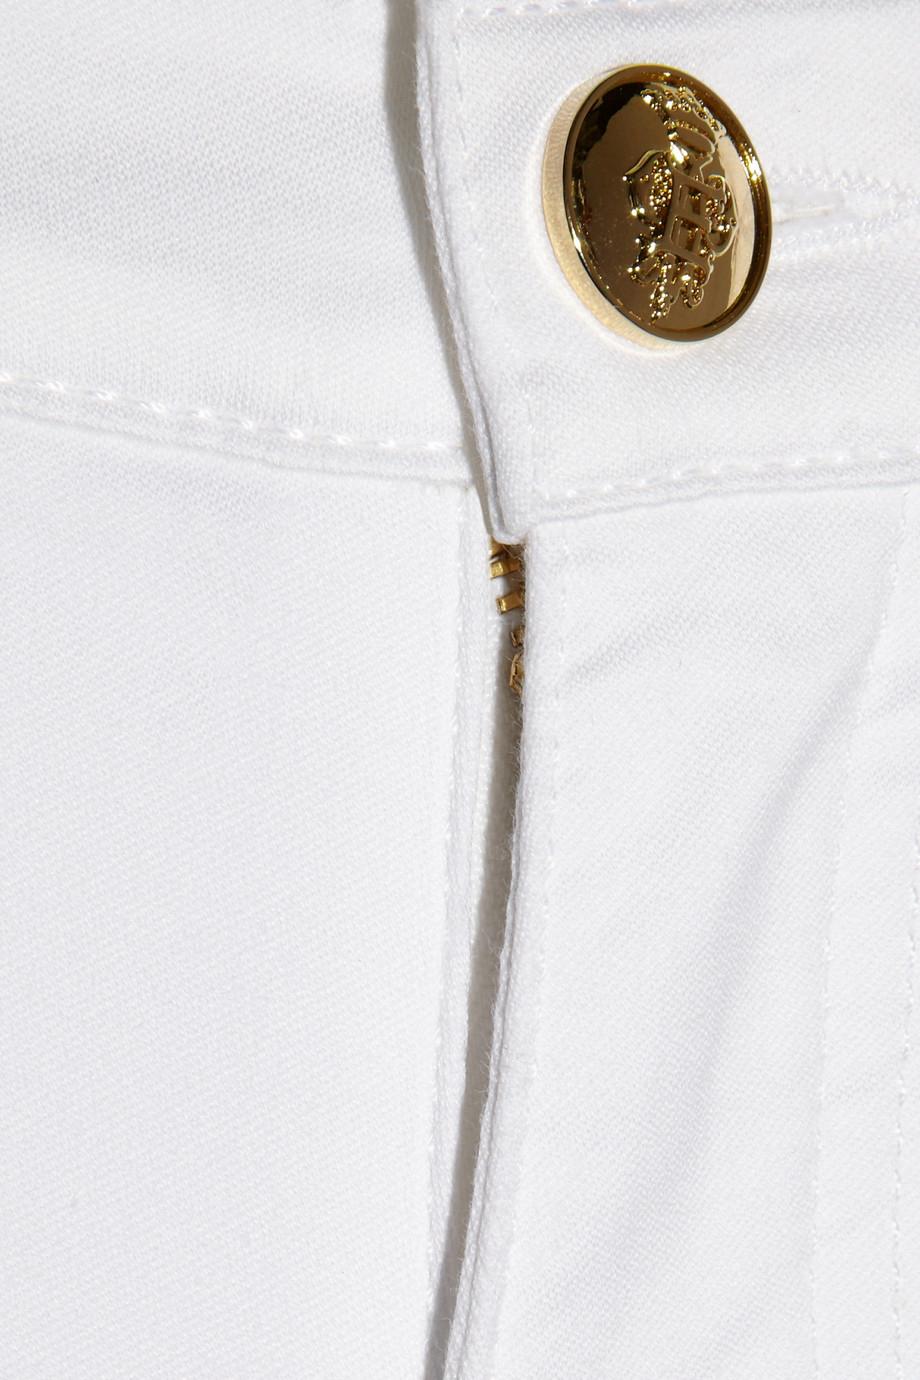 Emilio Pucci Lowrise Flared Jeans in White